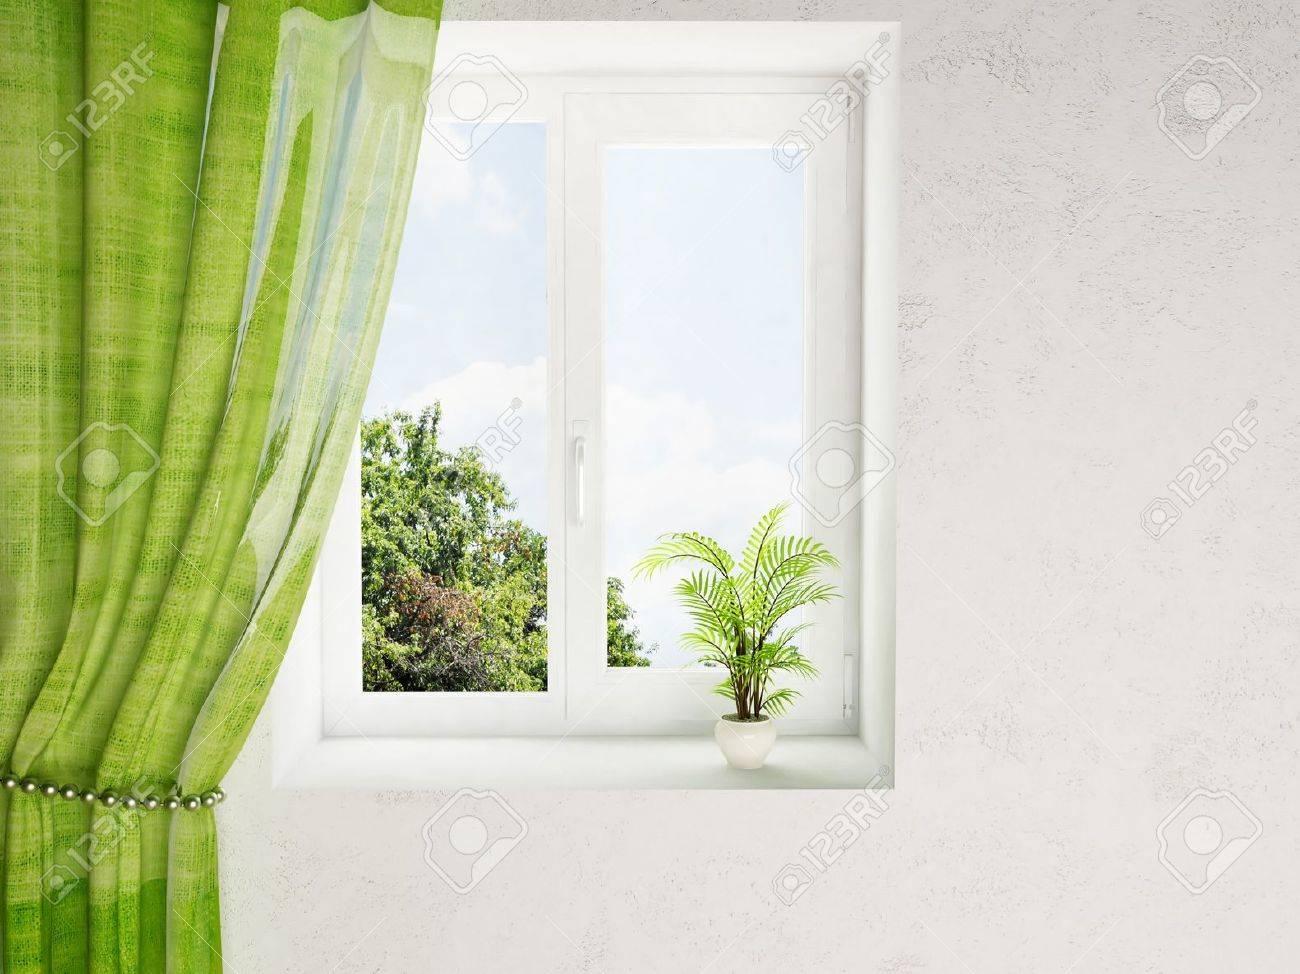 Interior Design Window interior design scene with a plant on the window stock photo